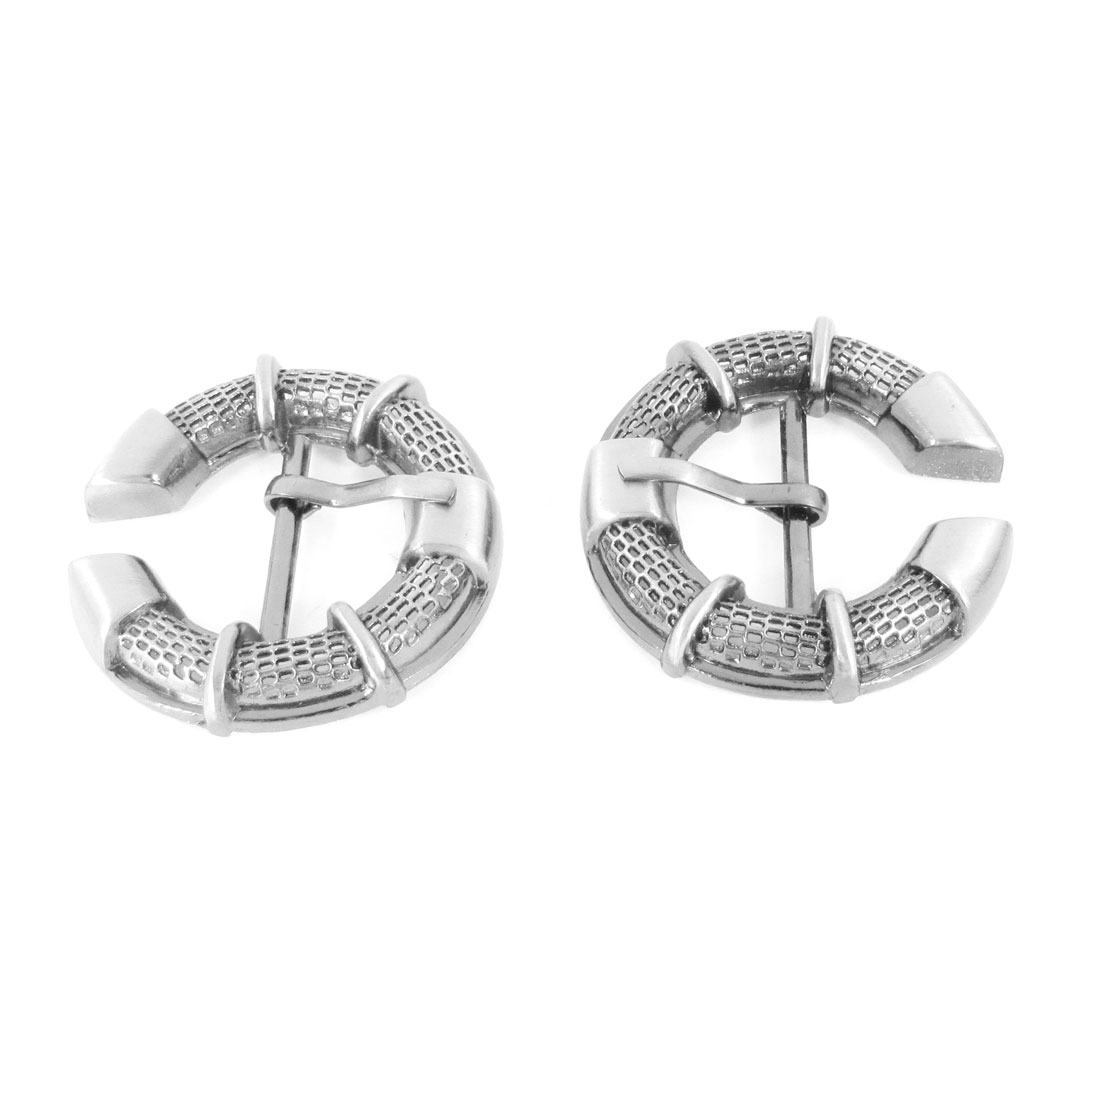 Handbag Shoes Belt Clothes Decor Multifunction Dark Gray Ring Pin Buckles 2Pcs